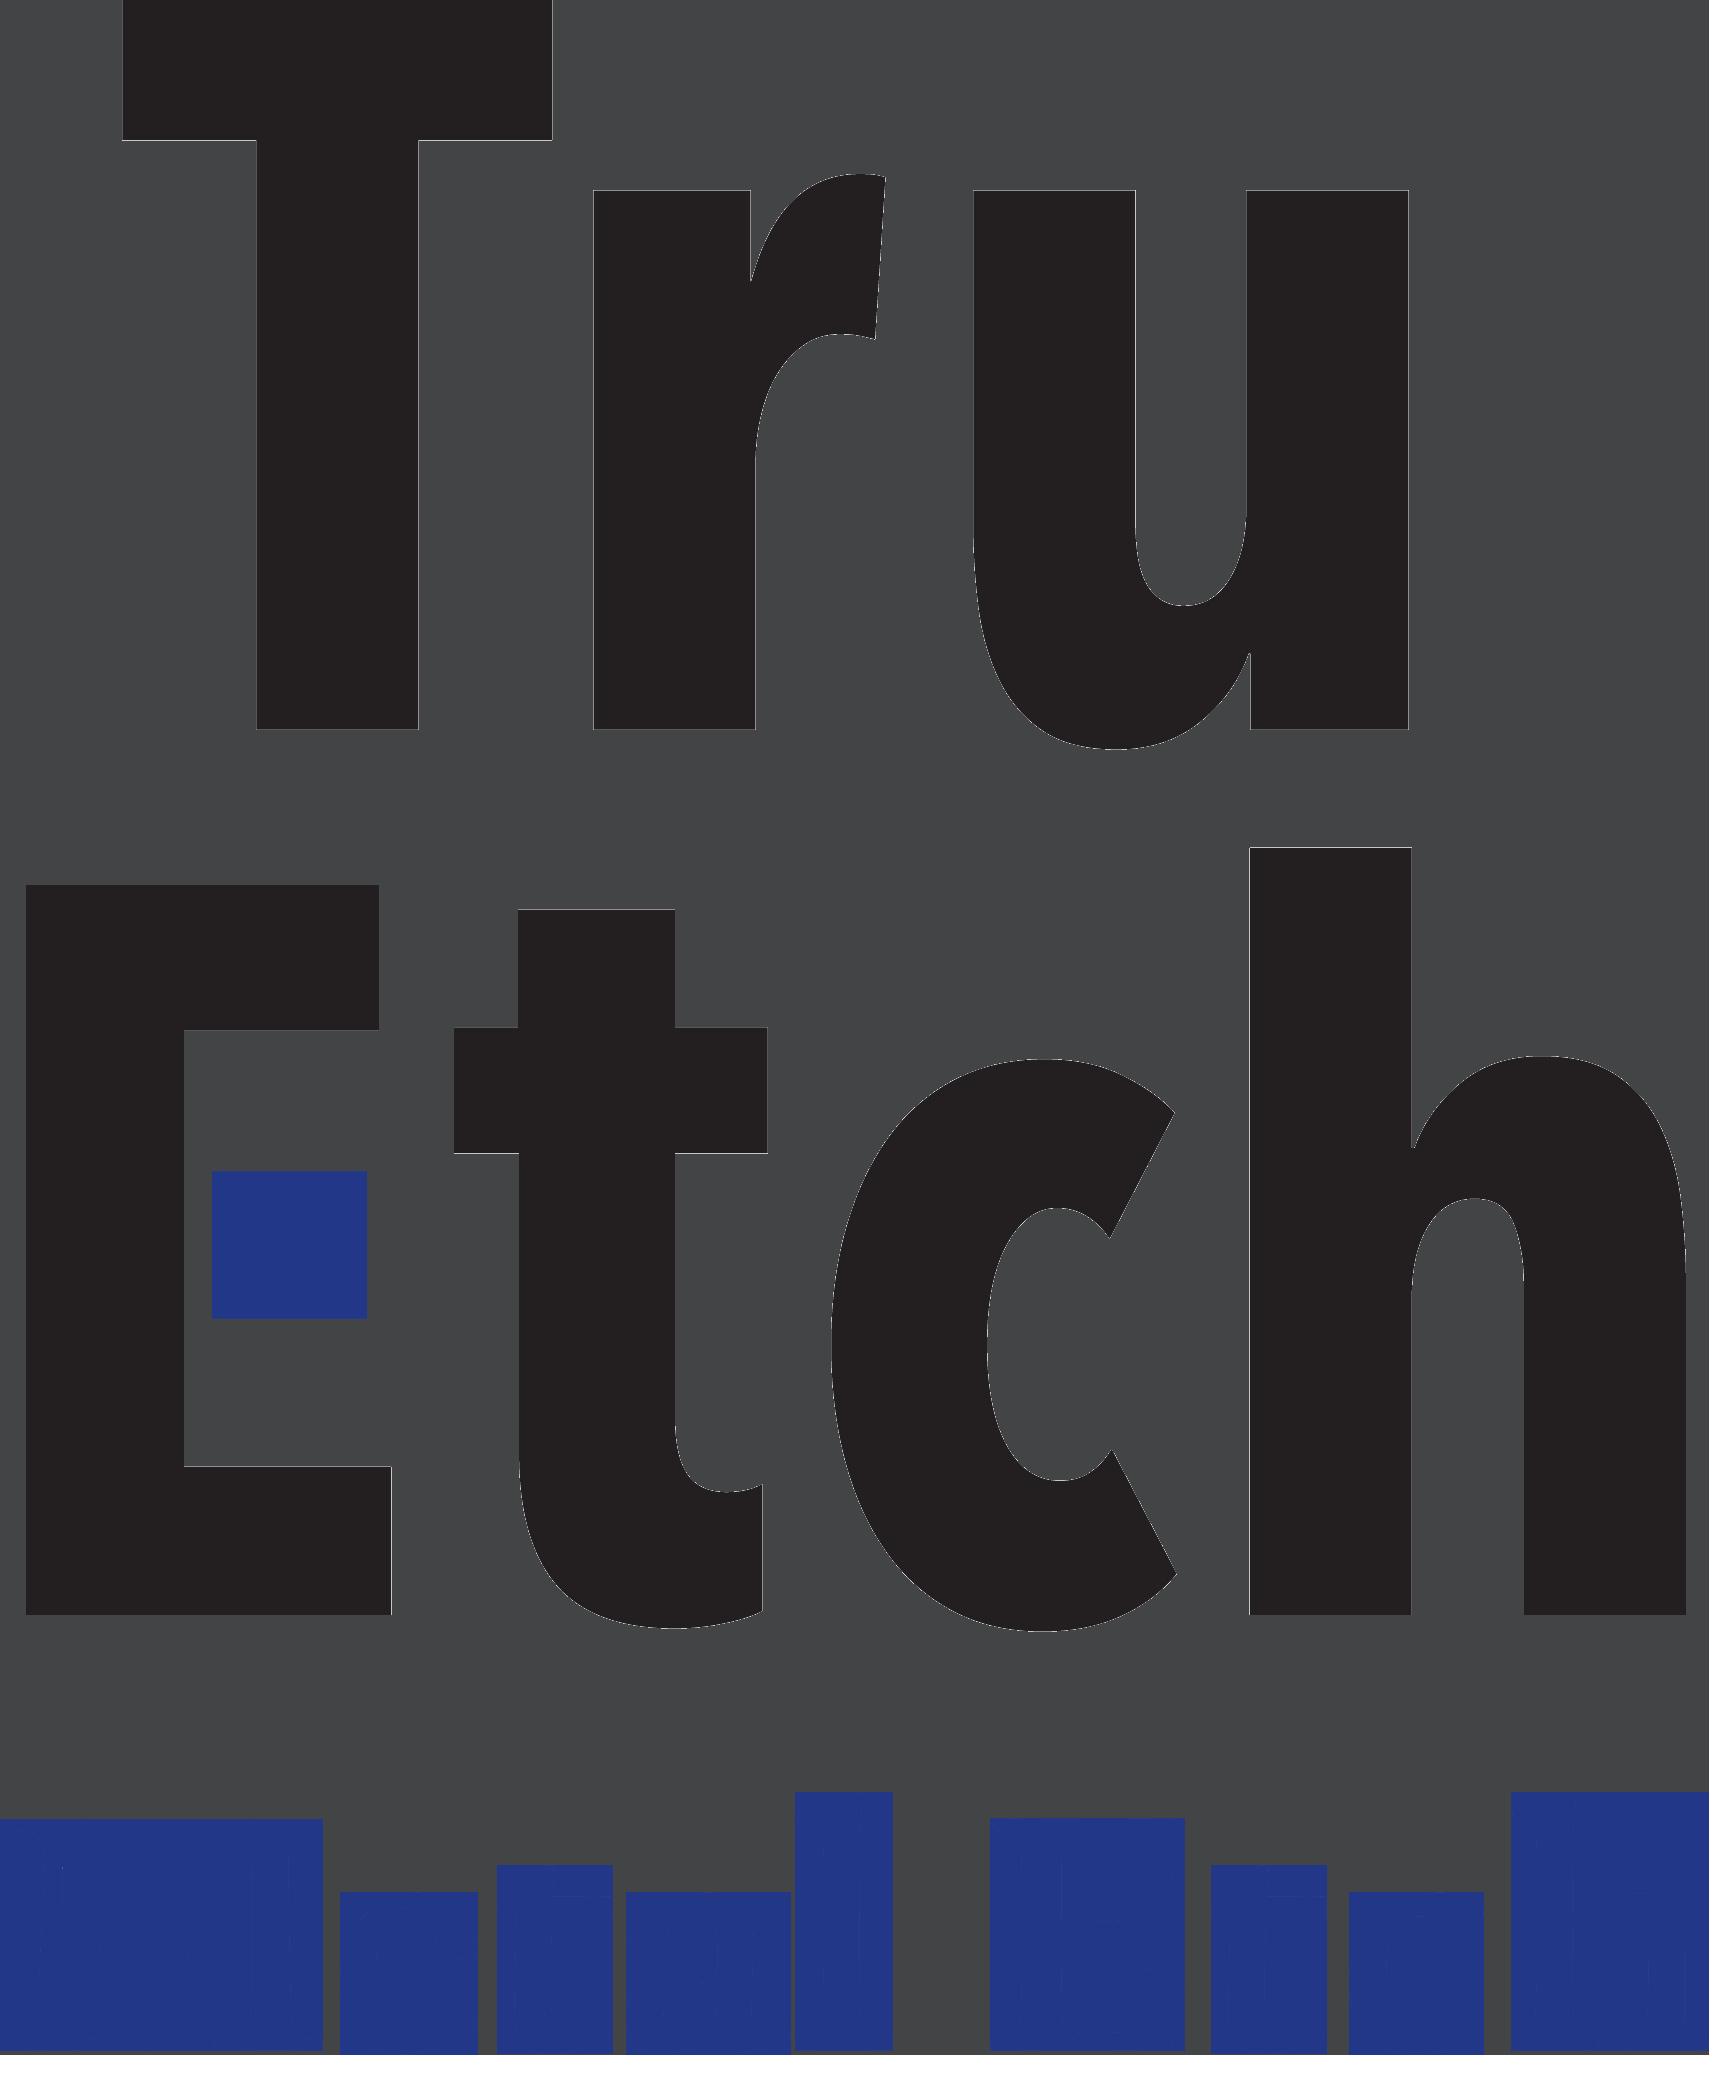 Logo-TruEtch_trimmed